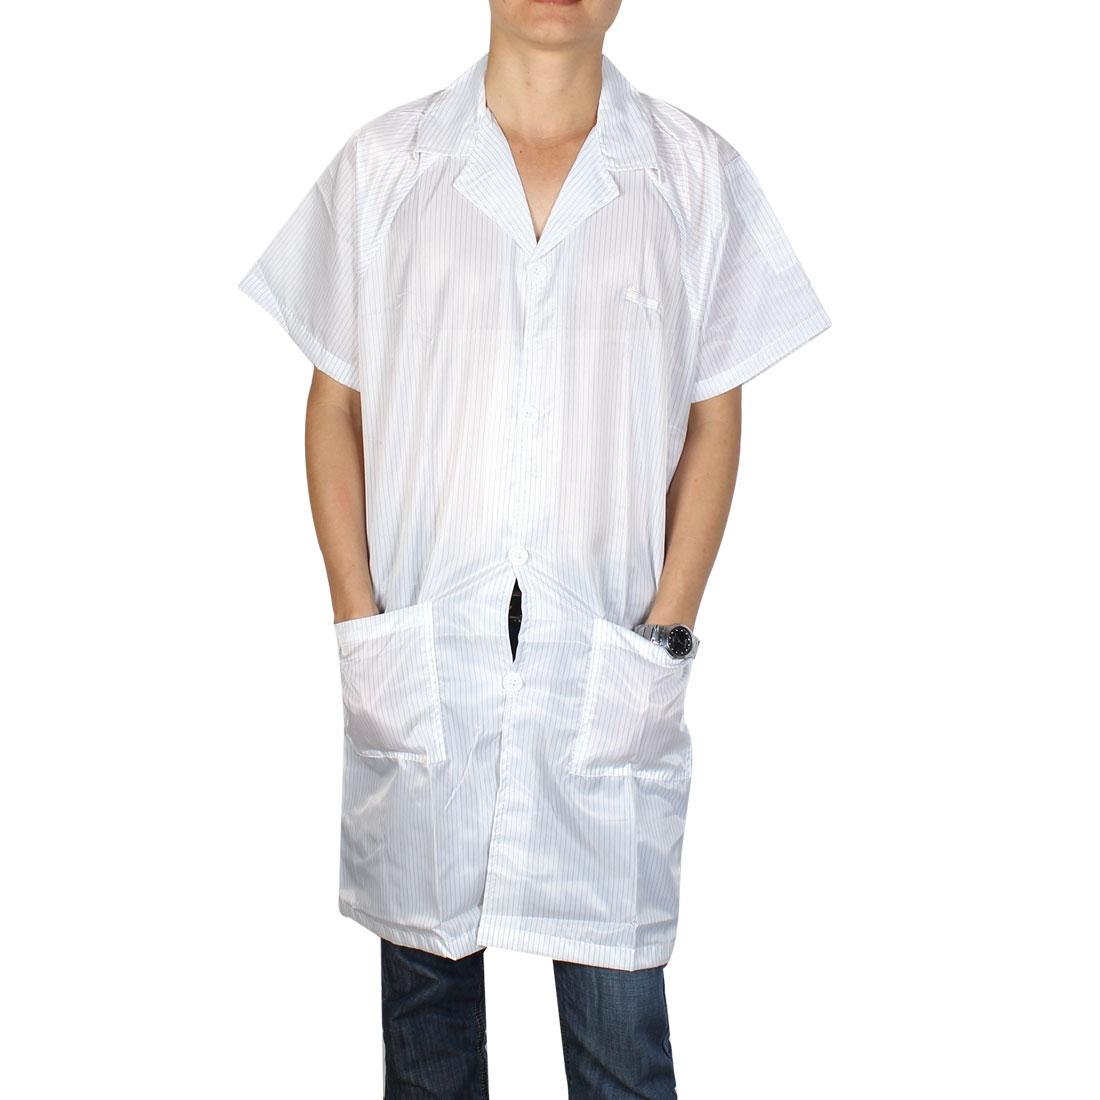 Unisex Lapel Collar Button Down Lab Anti Static Overalls Coat Uniform White L